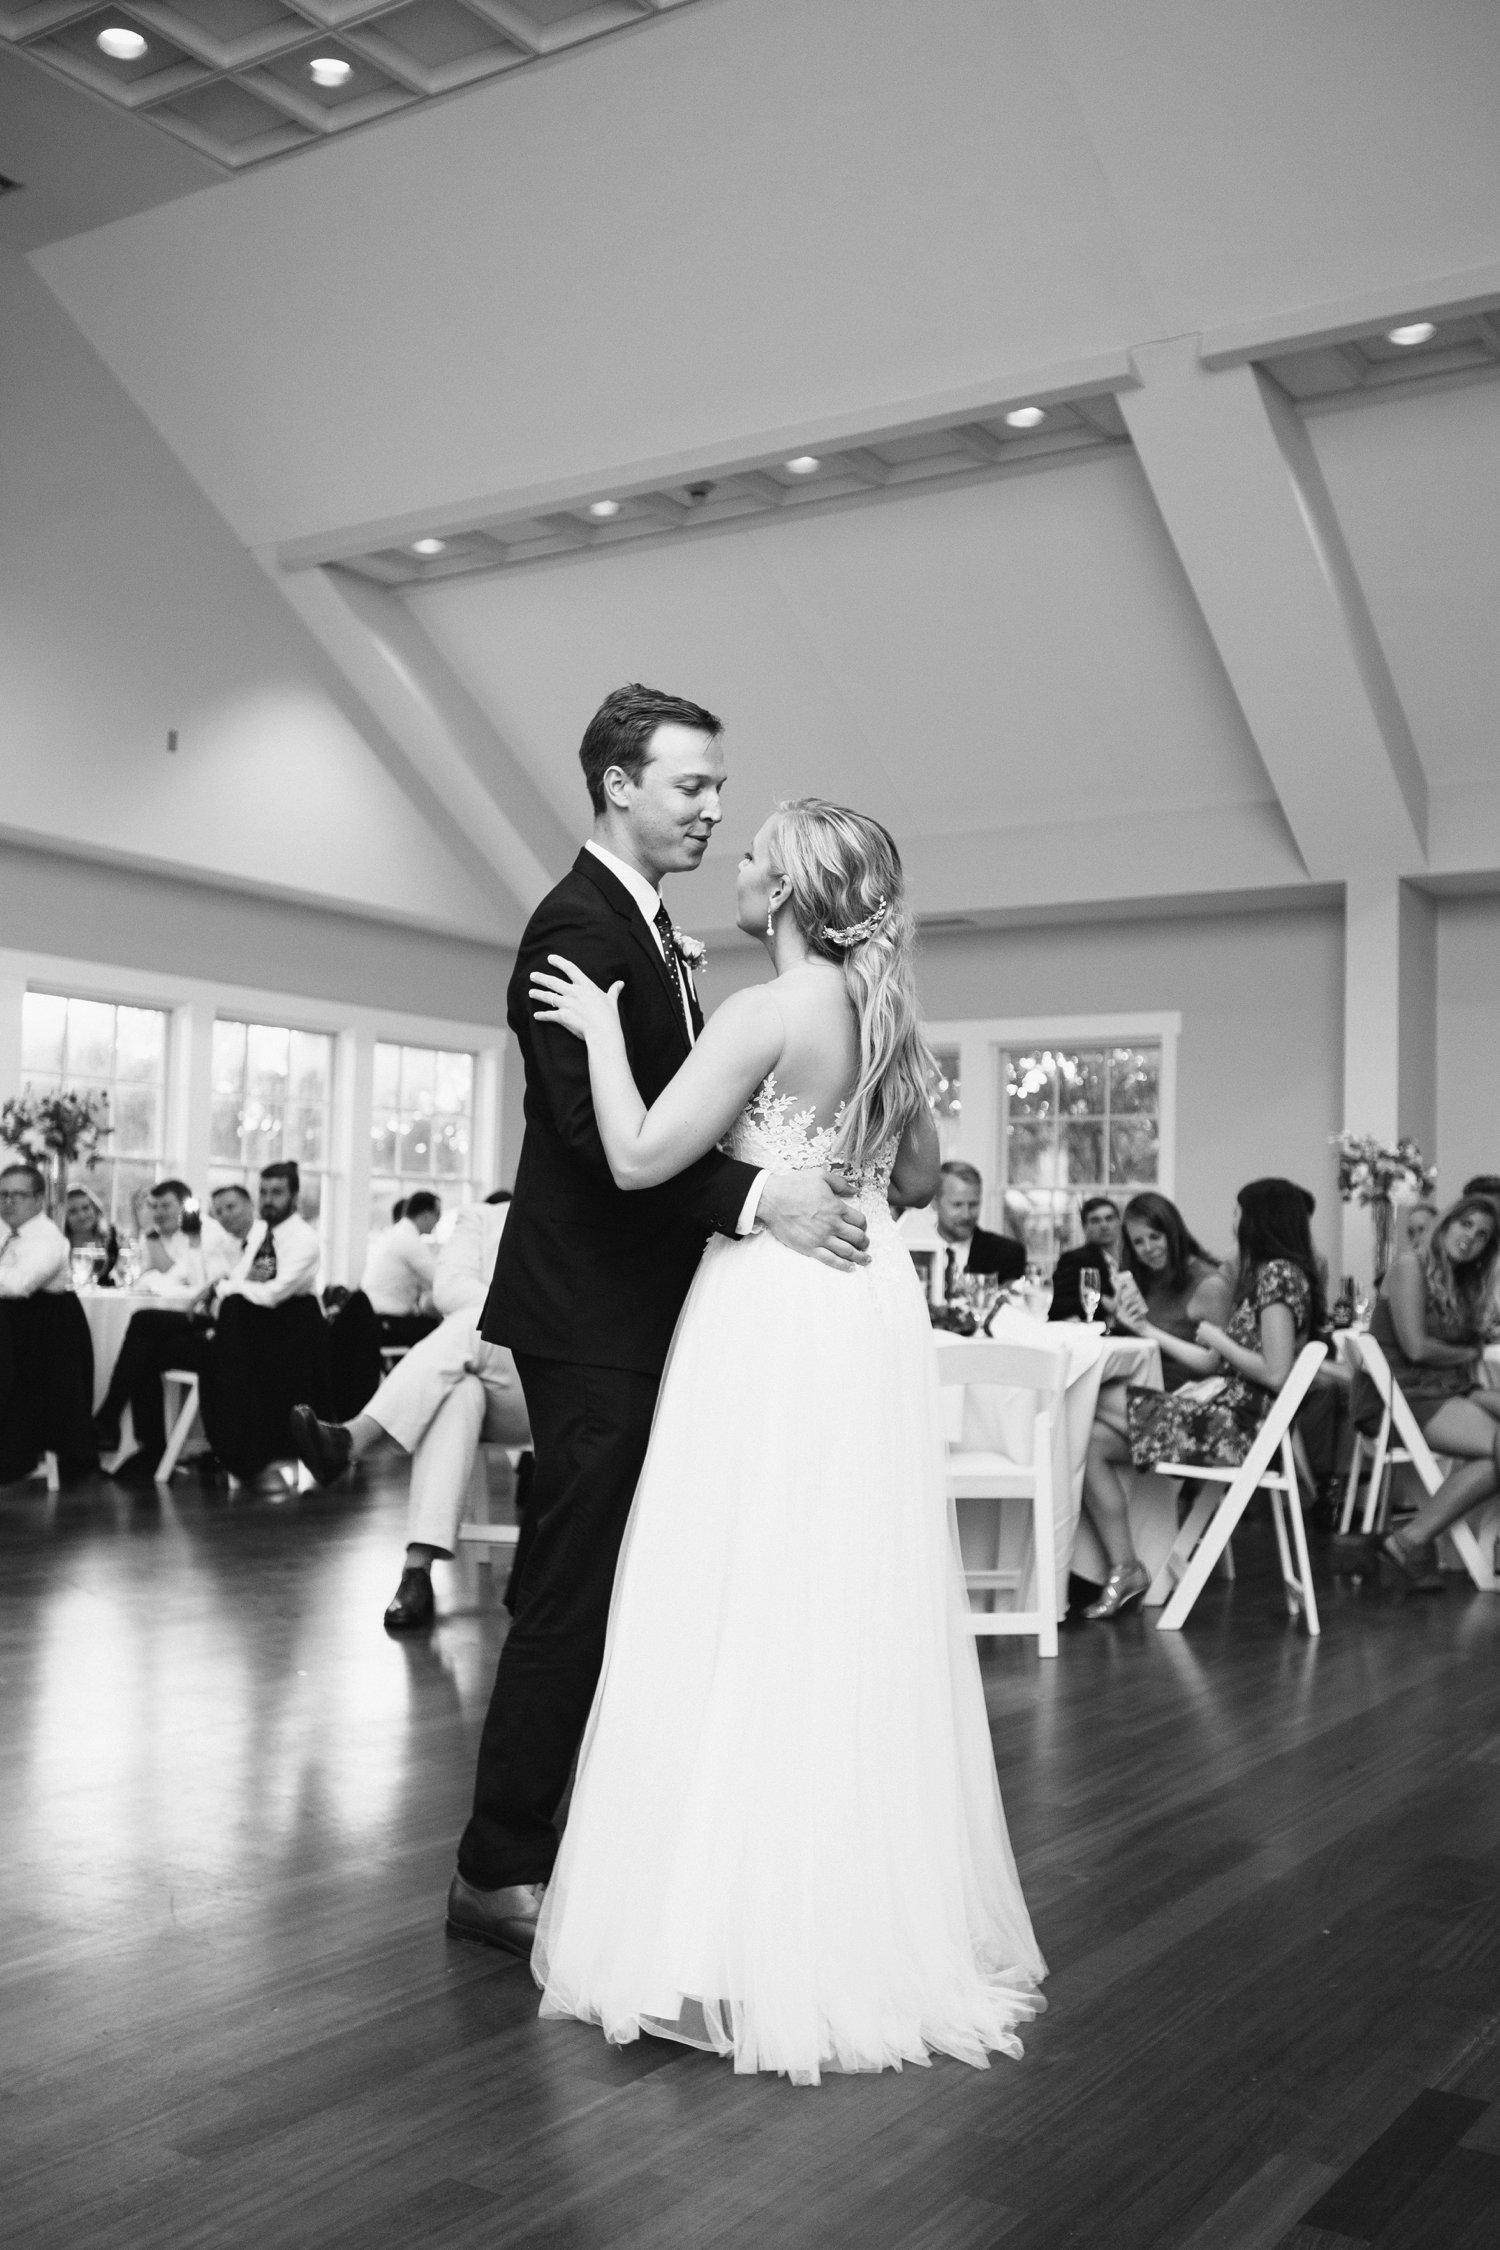 Lindsey_A_Miller_Photography_wedding_southport_community_building_bubbly_events_north_carolina_coasta_cannon_nautical_historic_082.jpg